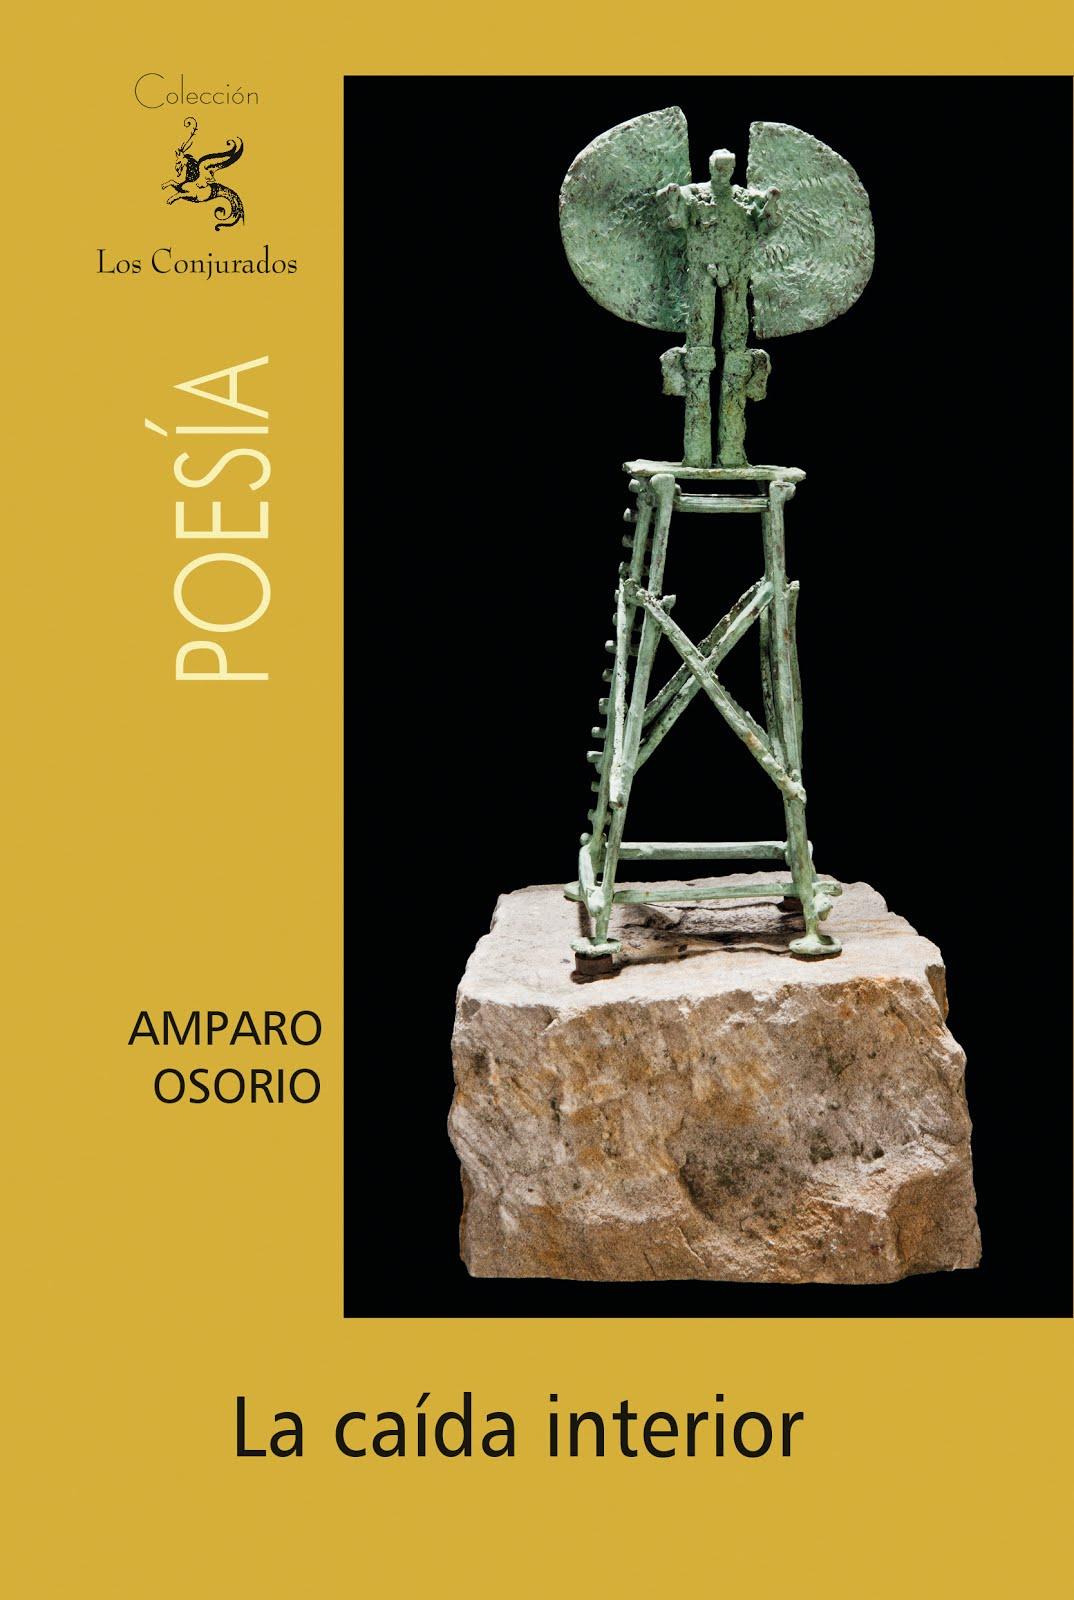 LIBROS DE AMPARO OSORIO